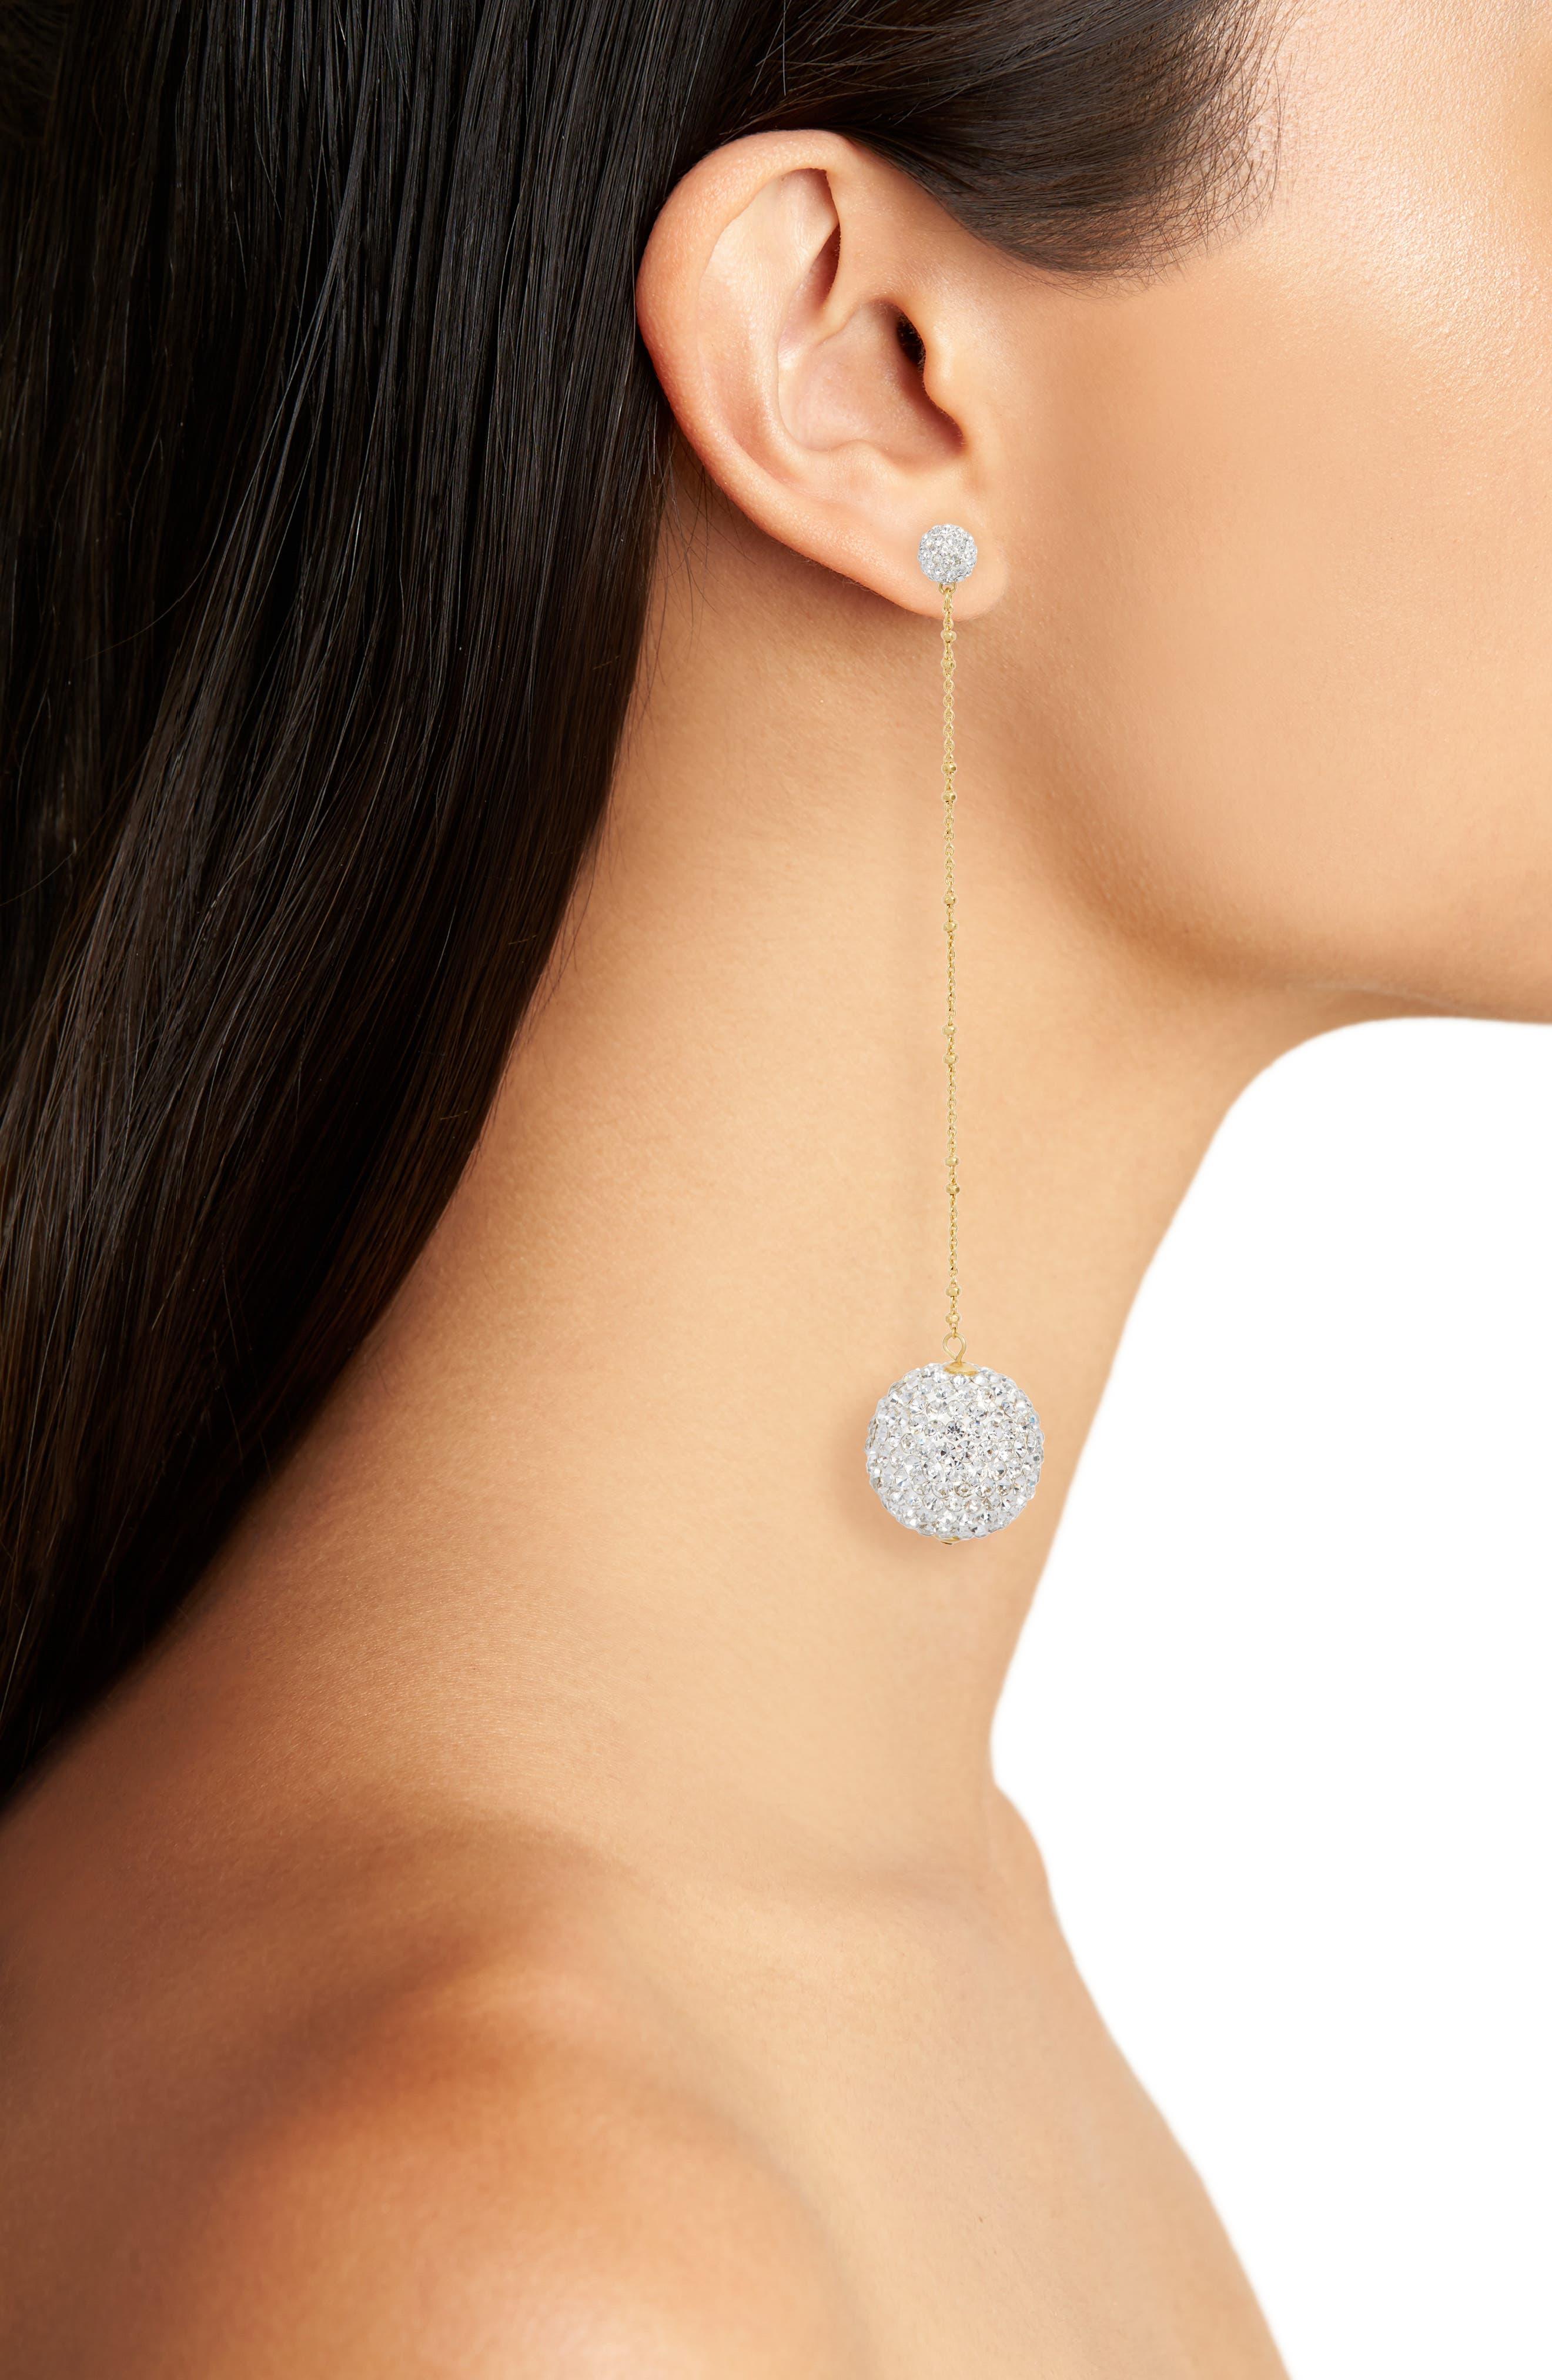 KATE SPADE NEW YORK,                             razzle dazzle linear statement earrings,                             Alternate thumbnail 2, color,                             714